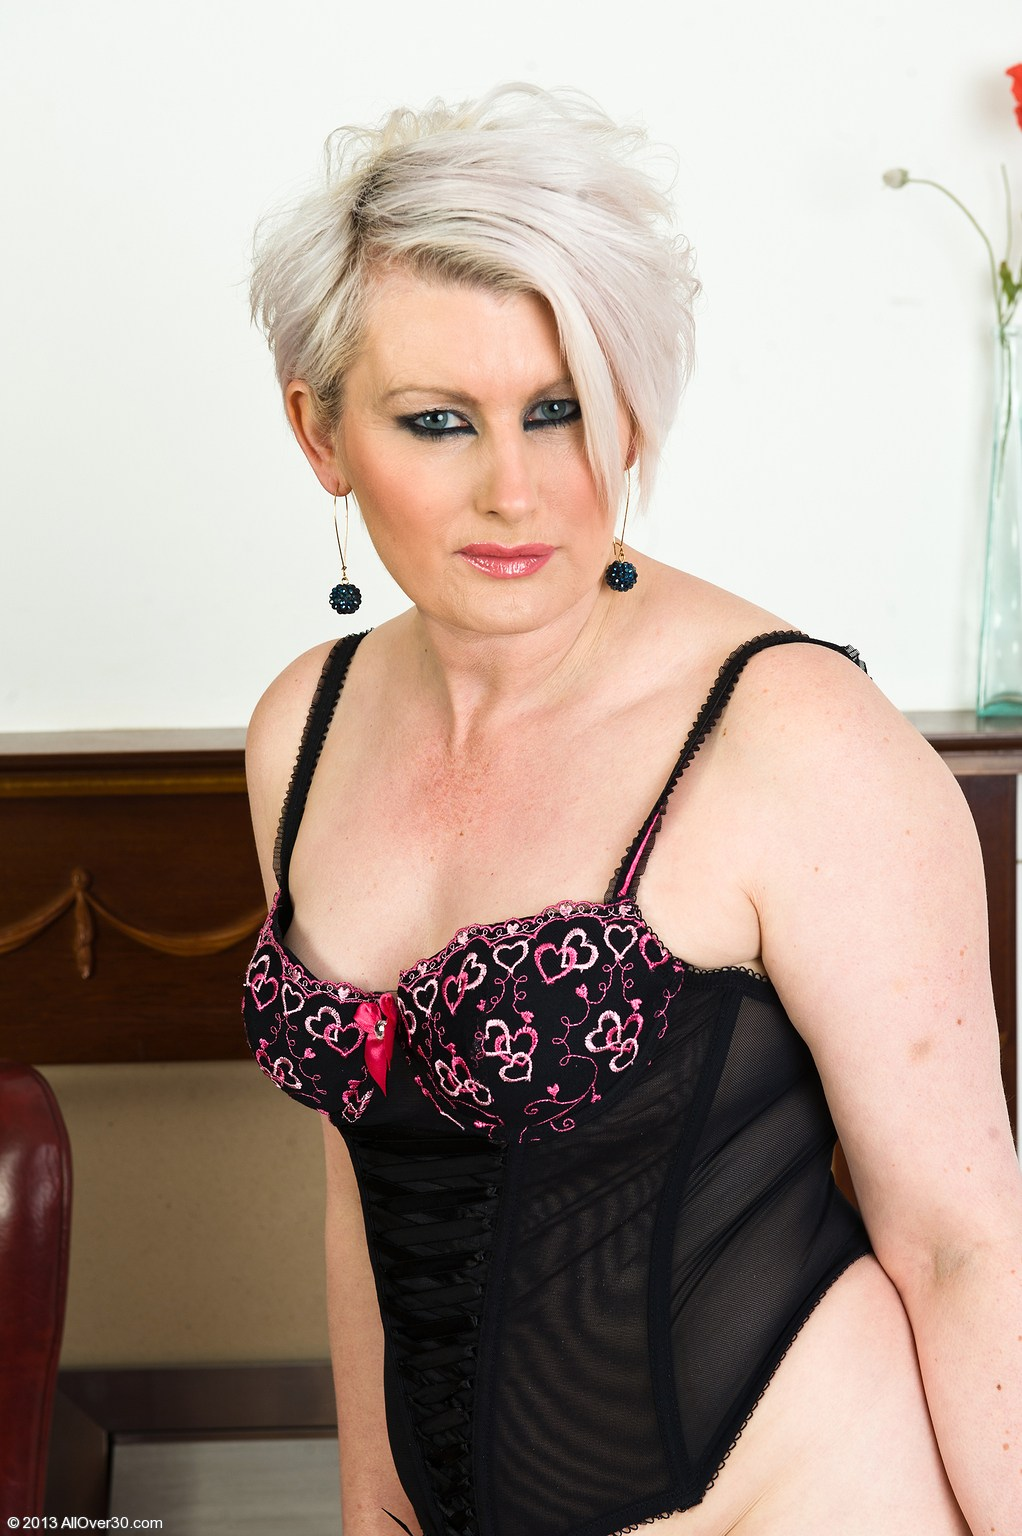 Sally taylor porn movies